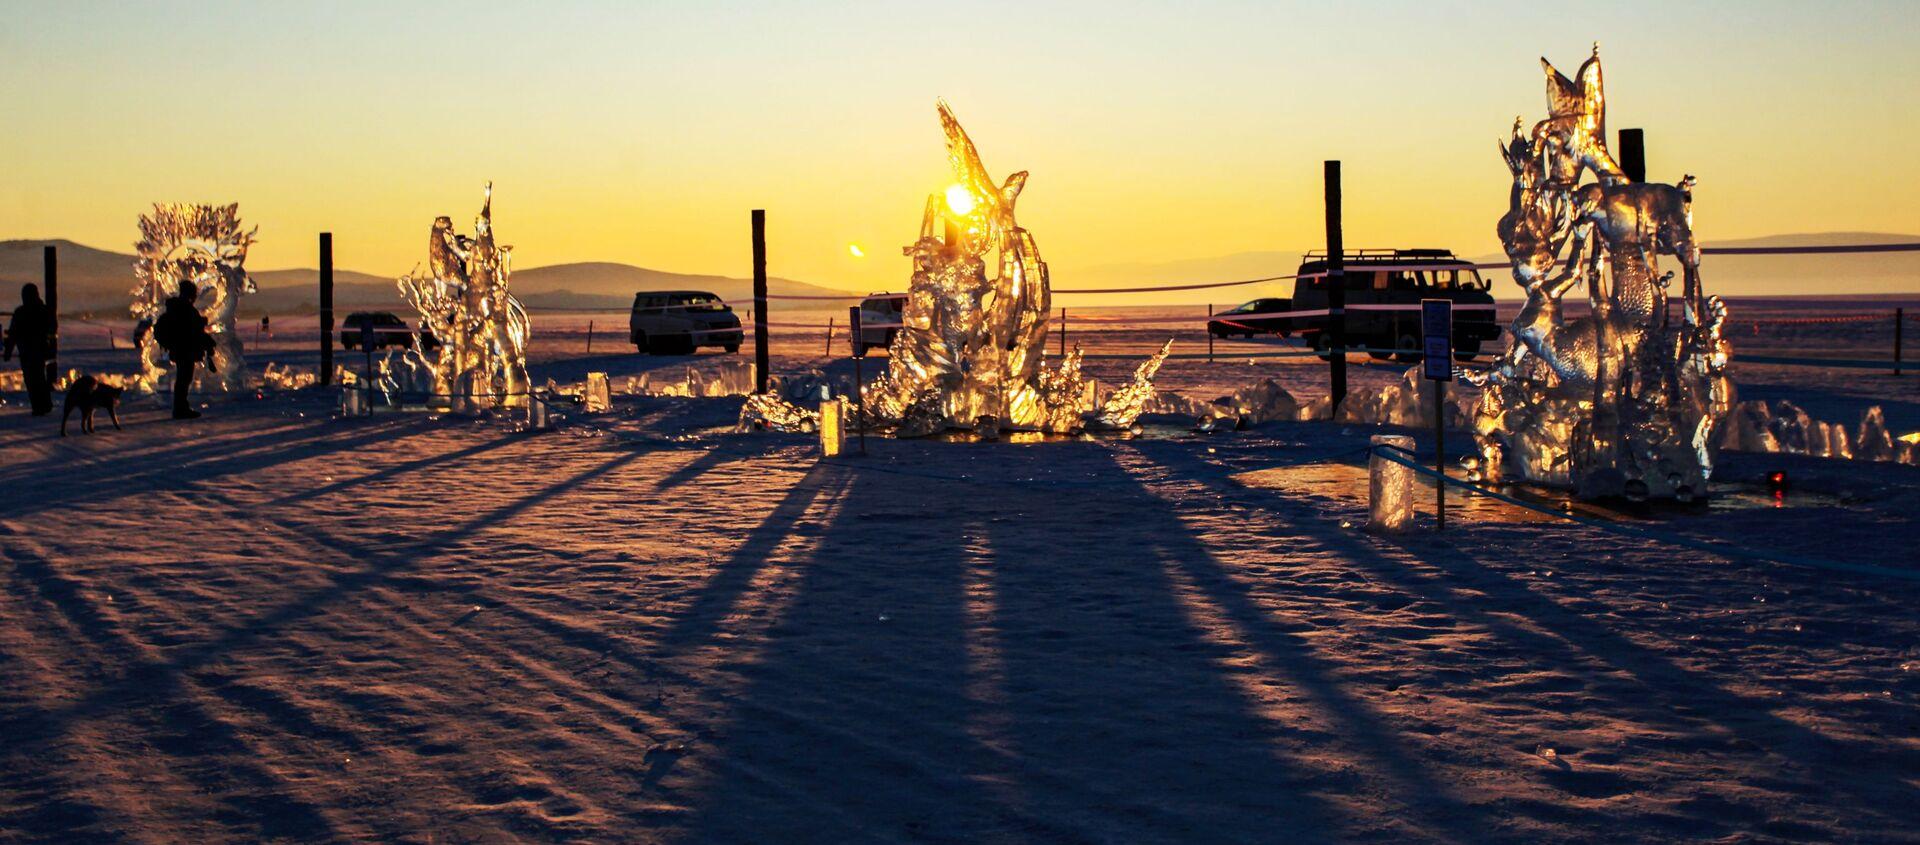 Festiwal Olkhon Ice Fest na jeziorze Bajkał - Sputnik Polska, 1920, 01.01.2021